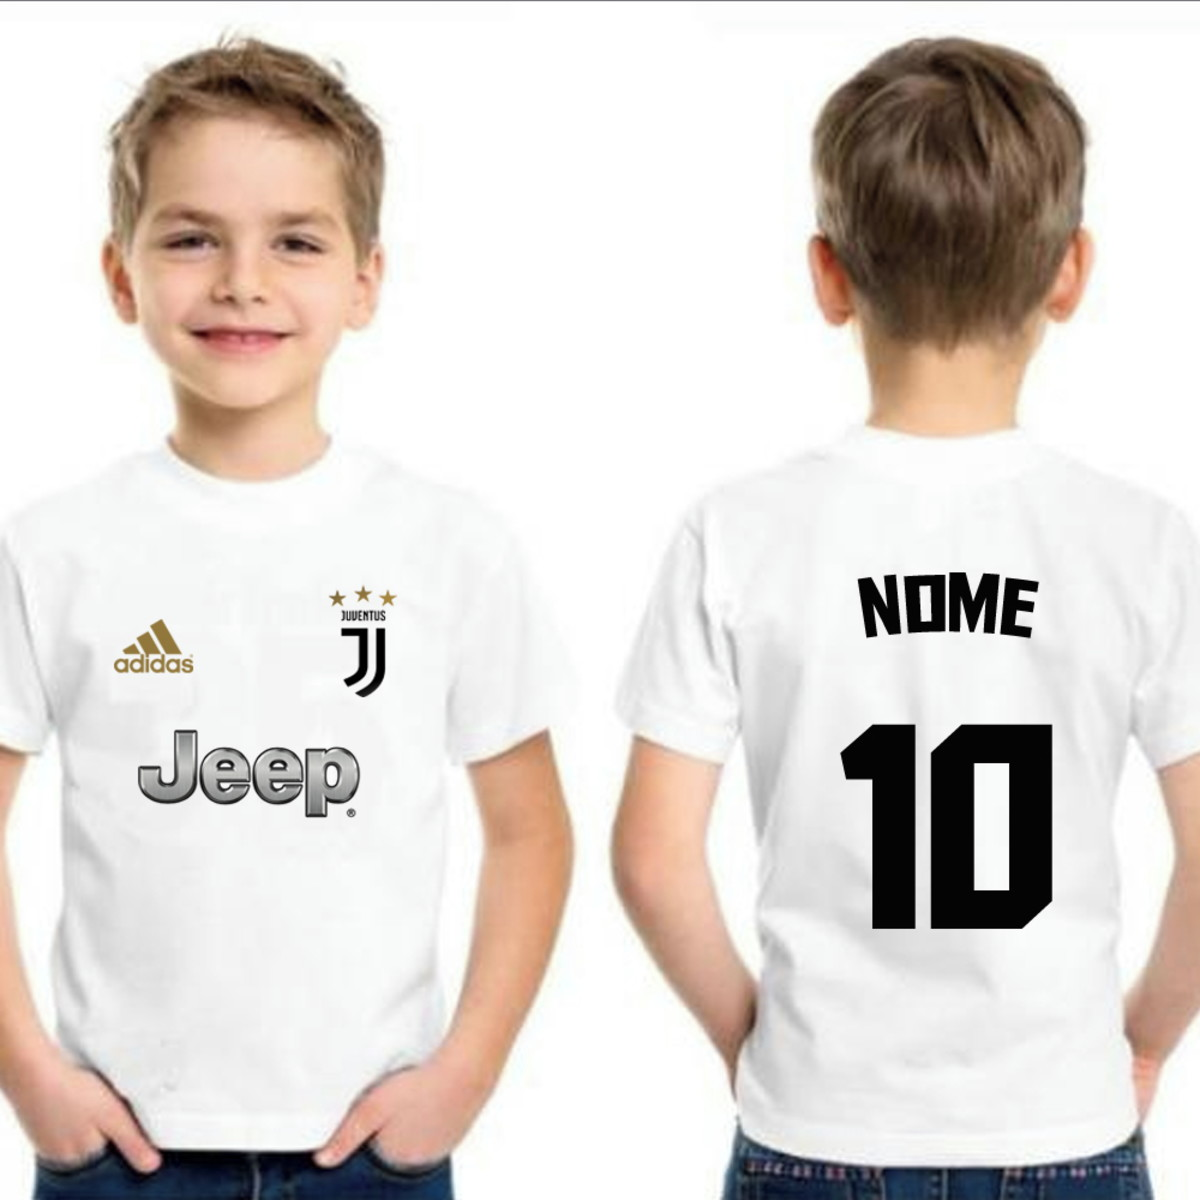 Camiseta Infantil Juventus Italia Personalizada no Elo7  cc65b0293d58f